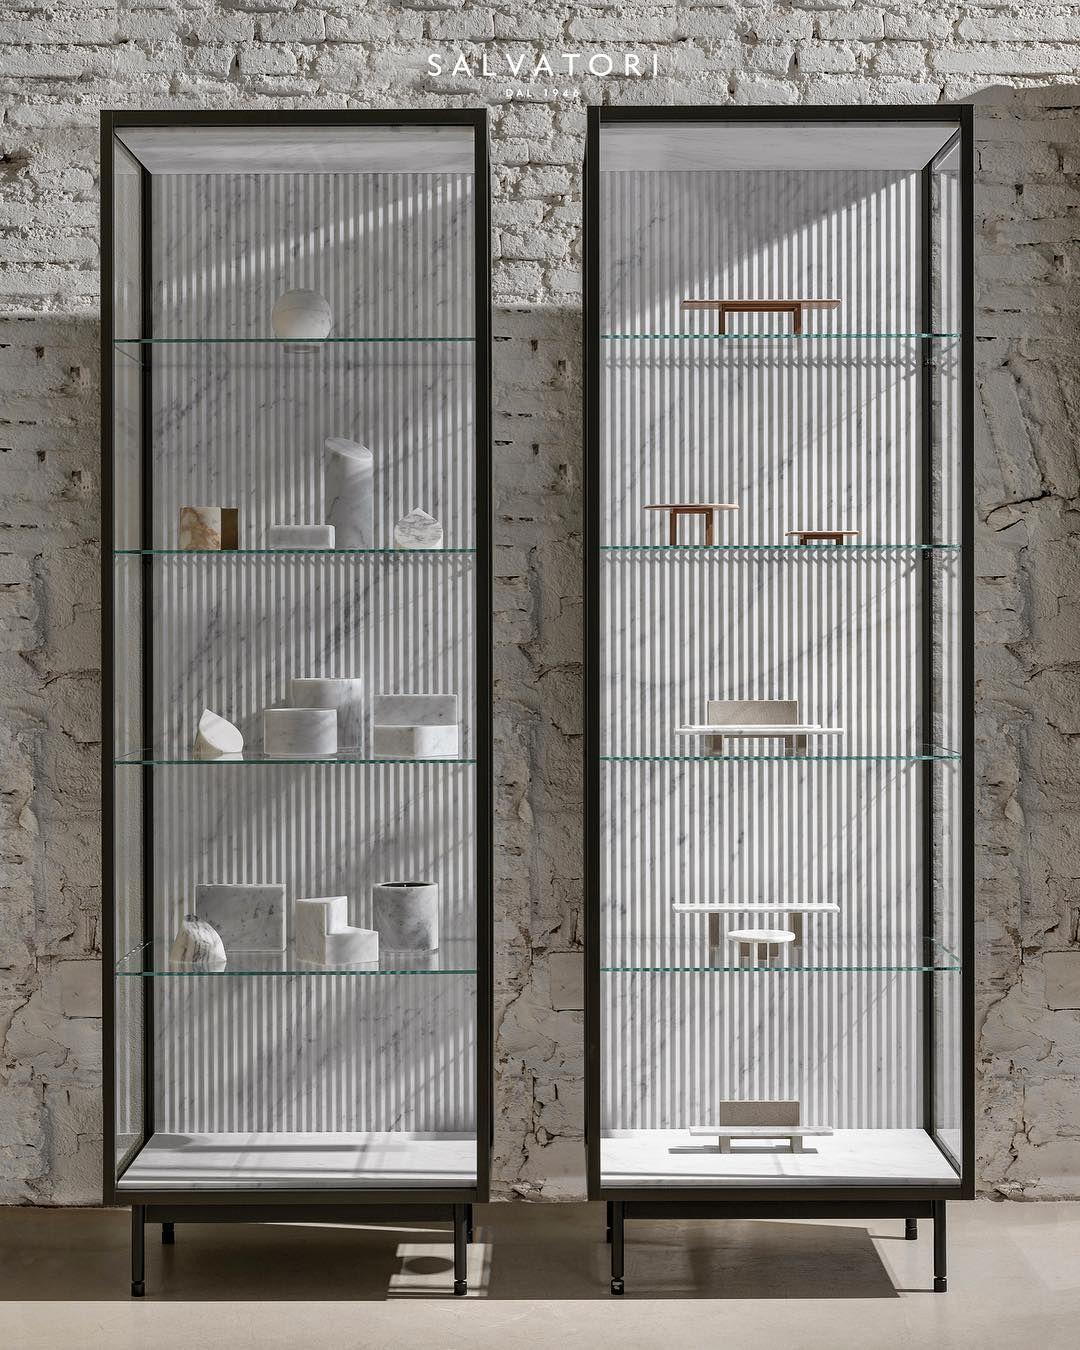 "Ital Designs Hong Kong salvatori on instagram: ""introducing the techa glass cabinet"